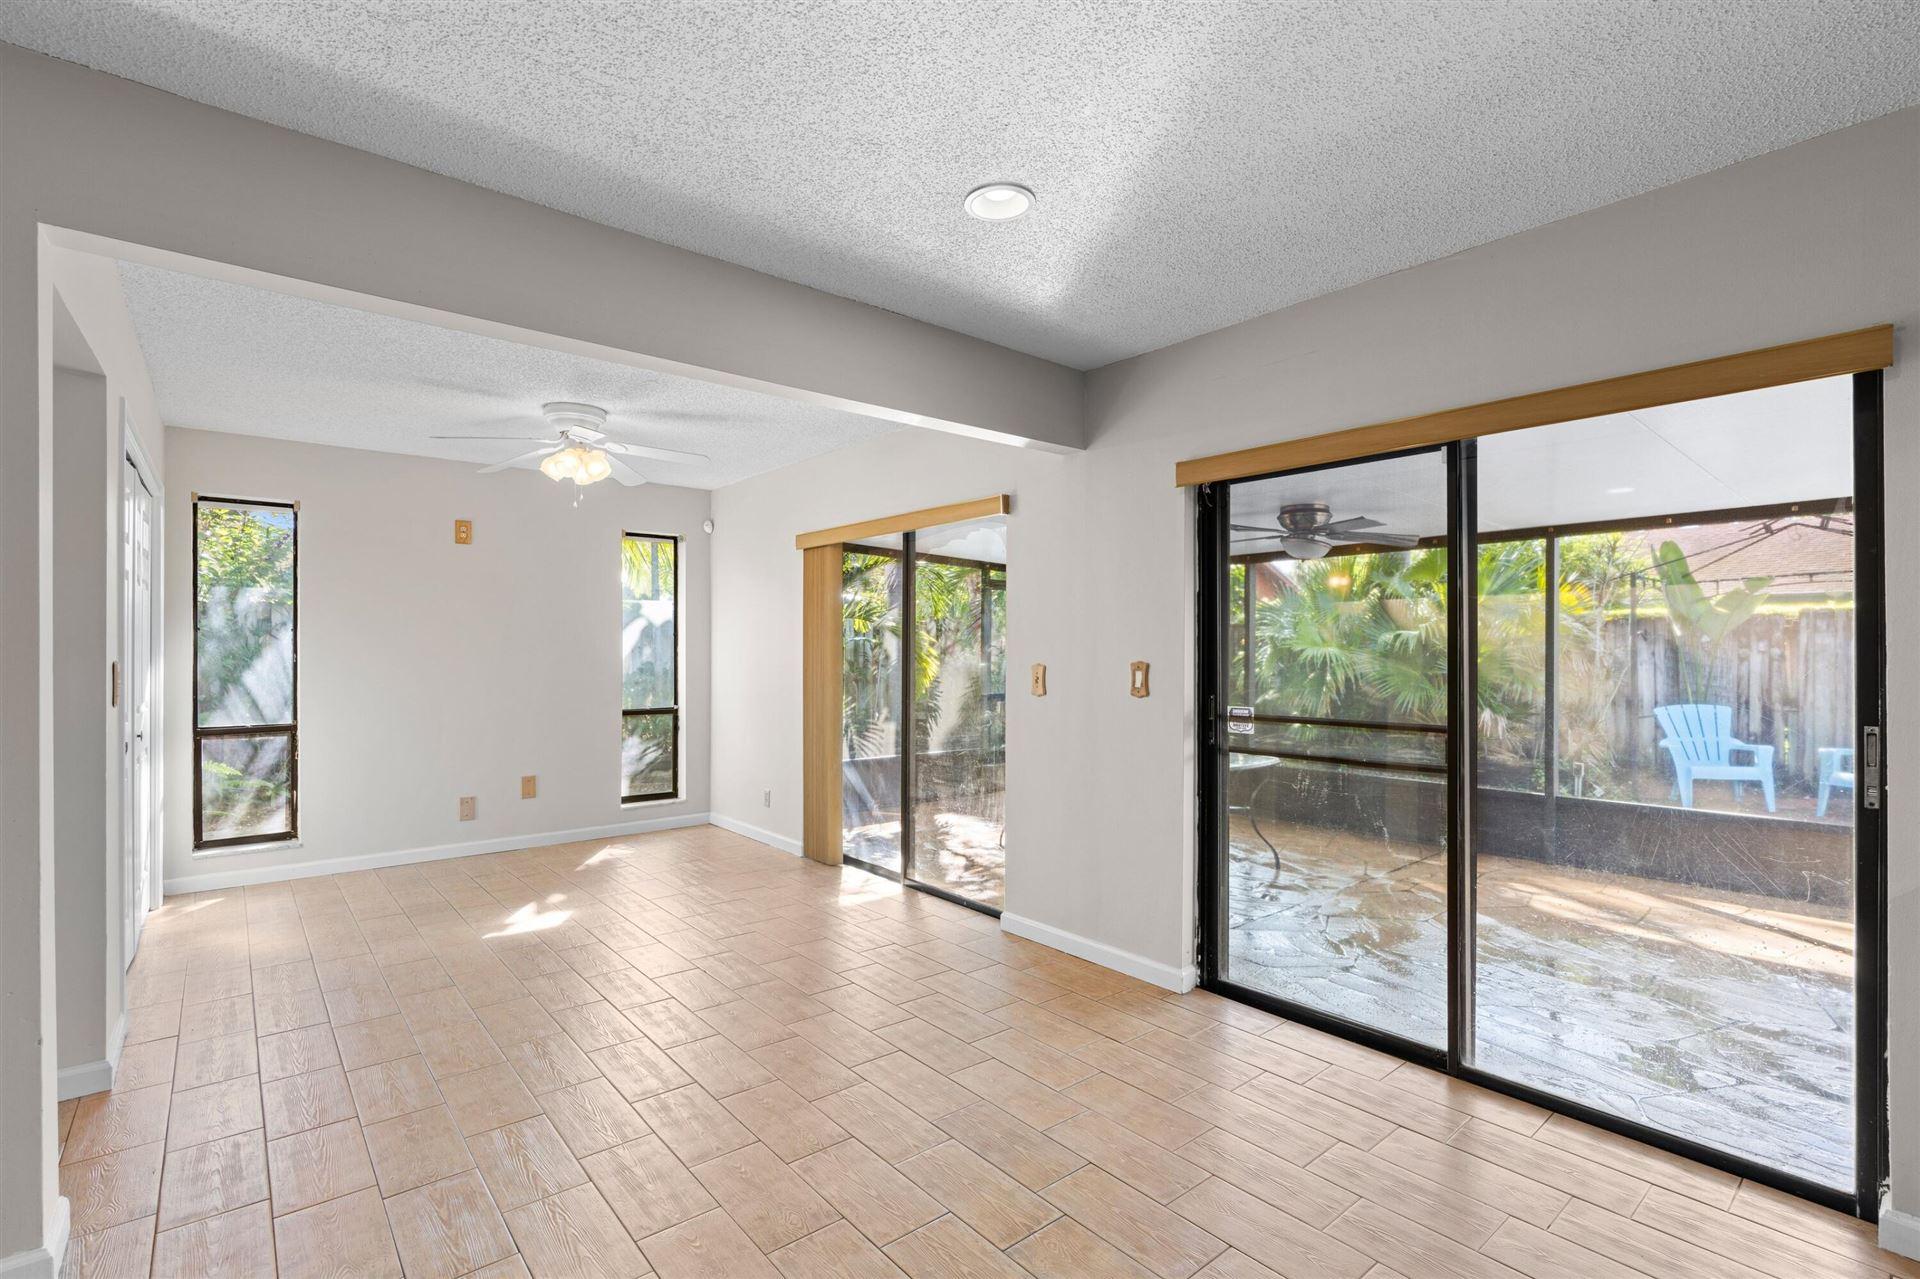 Photo of 3910 Winfield Road, Boynton Beach, FL 33436 (MLS # RX-10753579)